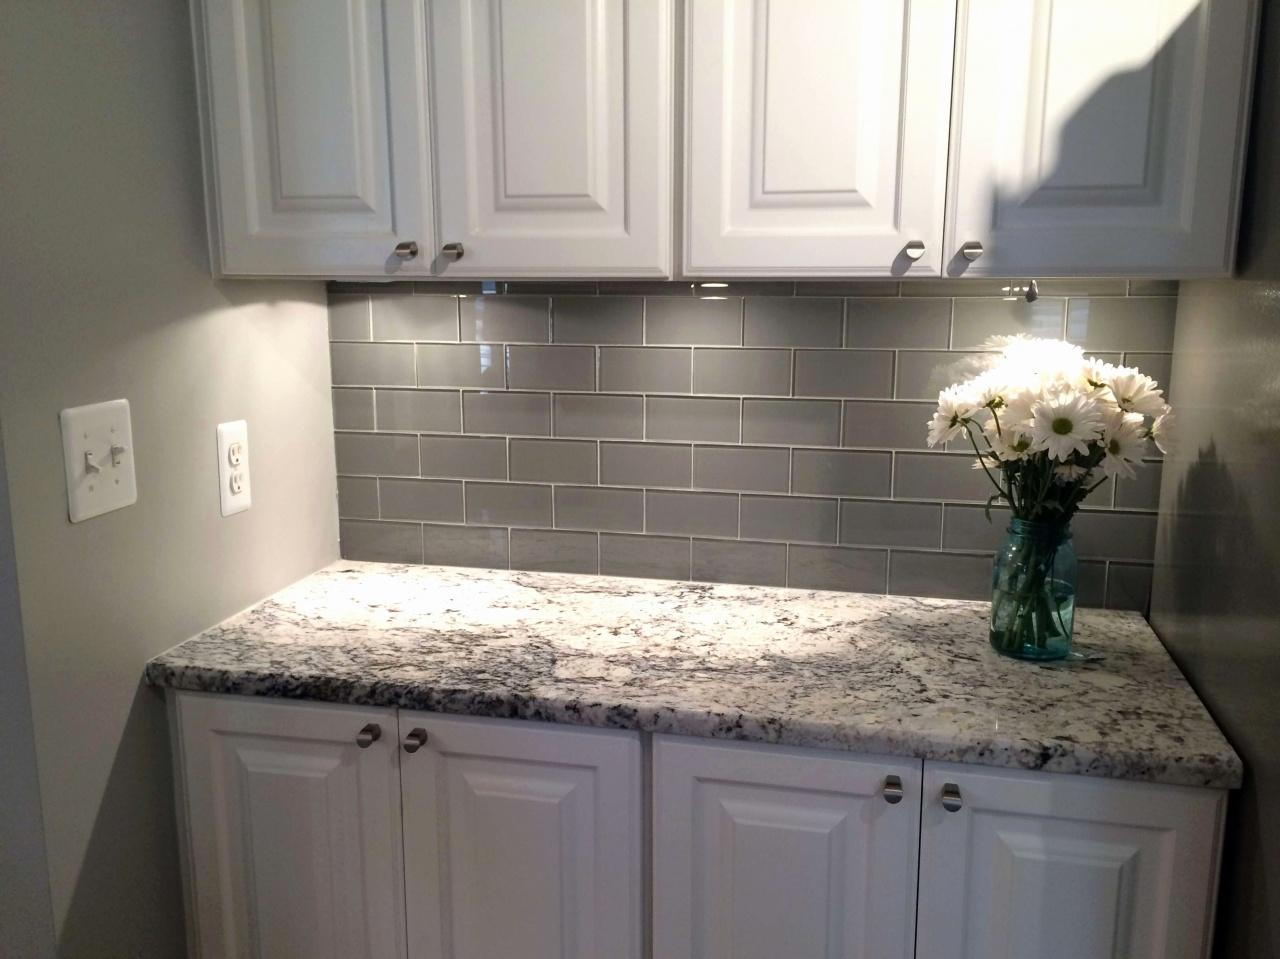 kitchen backsplash paneling 67 new white glass tile kitchen backsplash from kitchen backsplash paneling